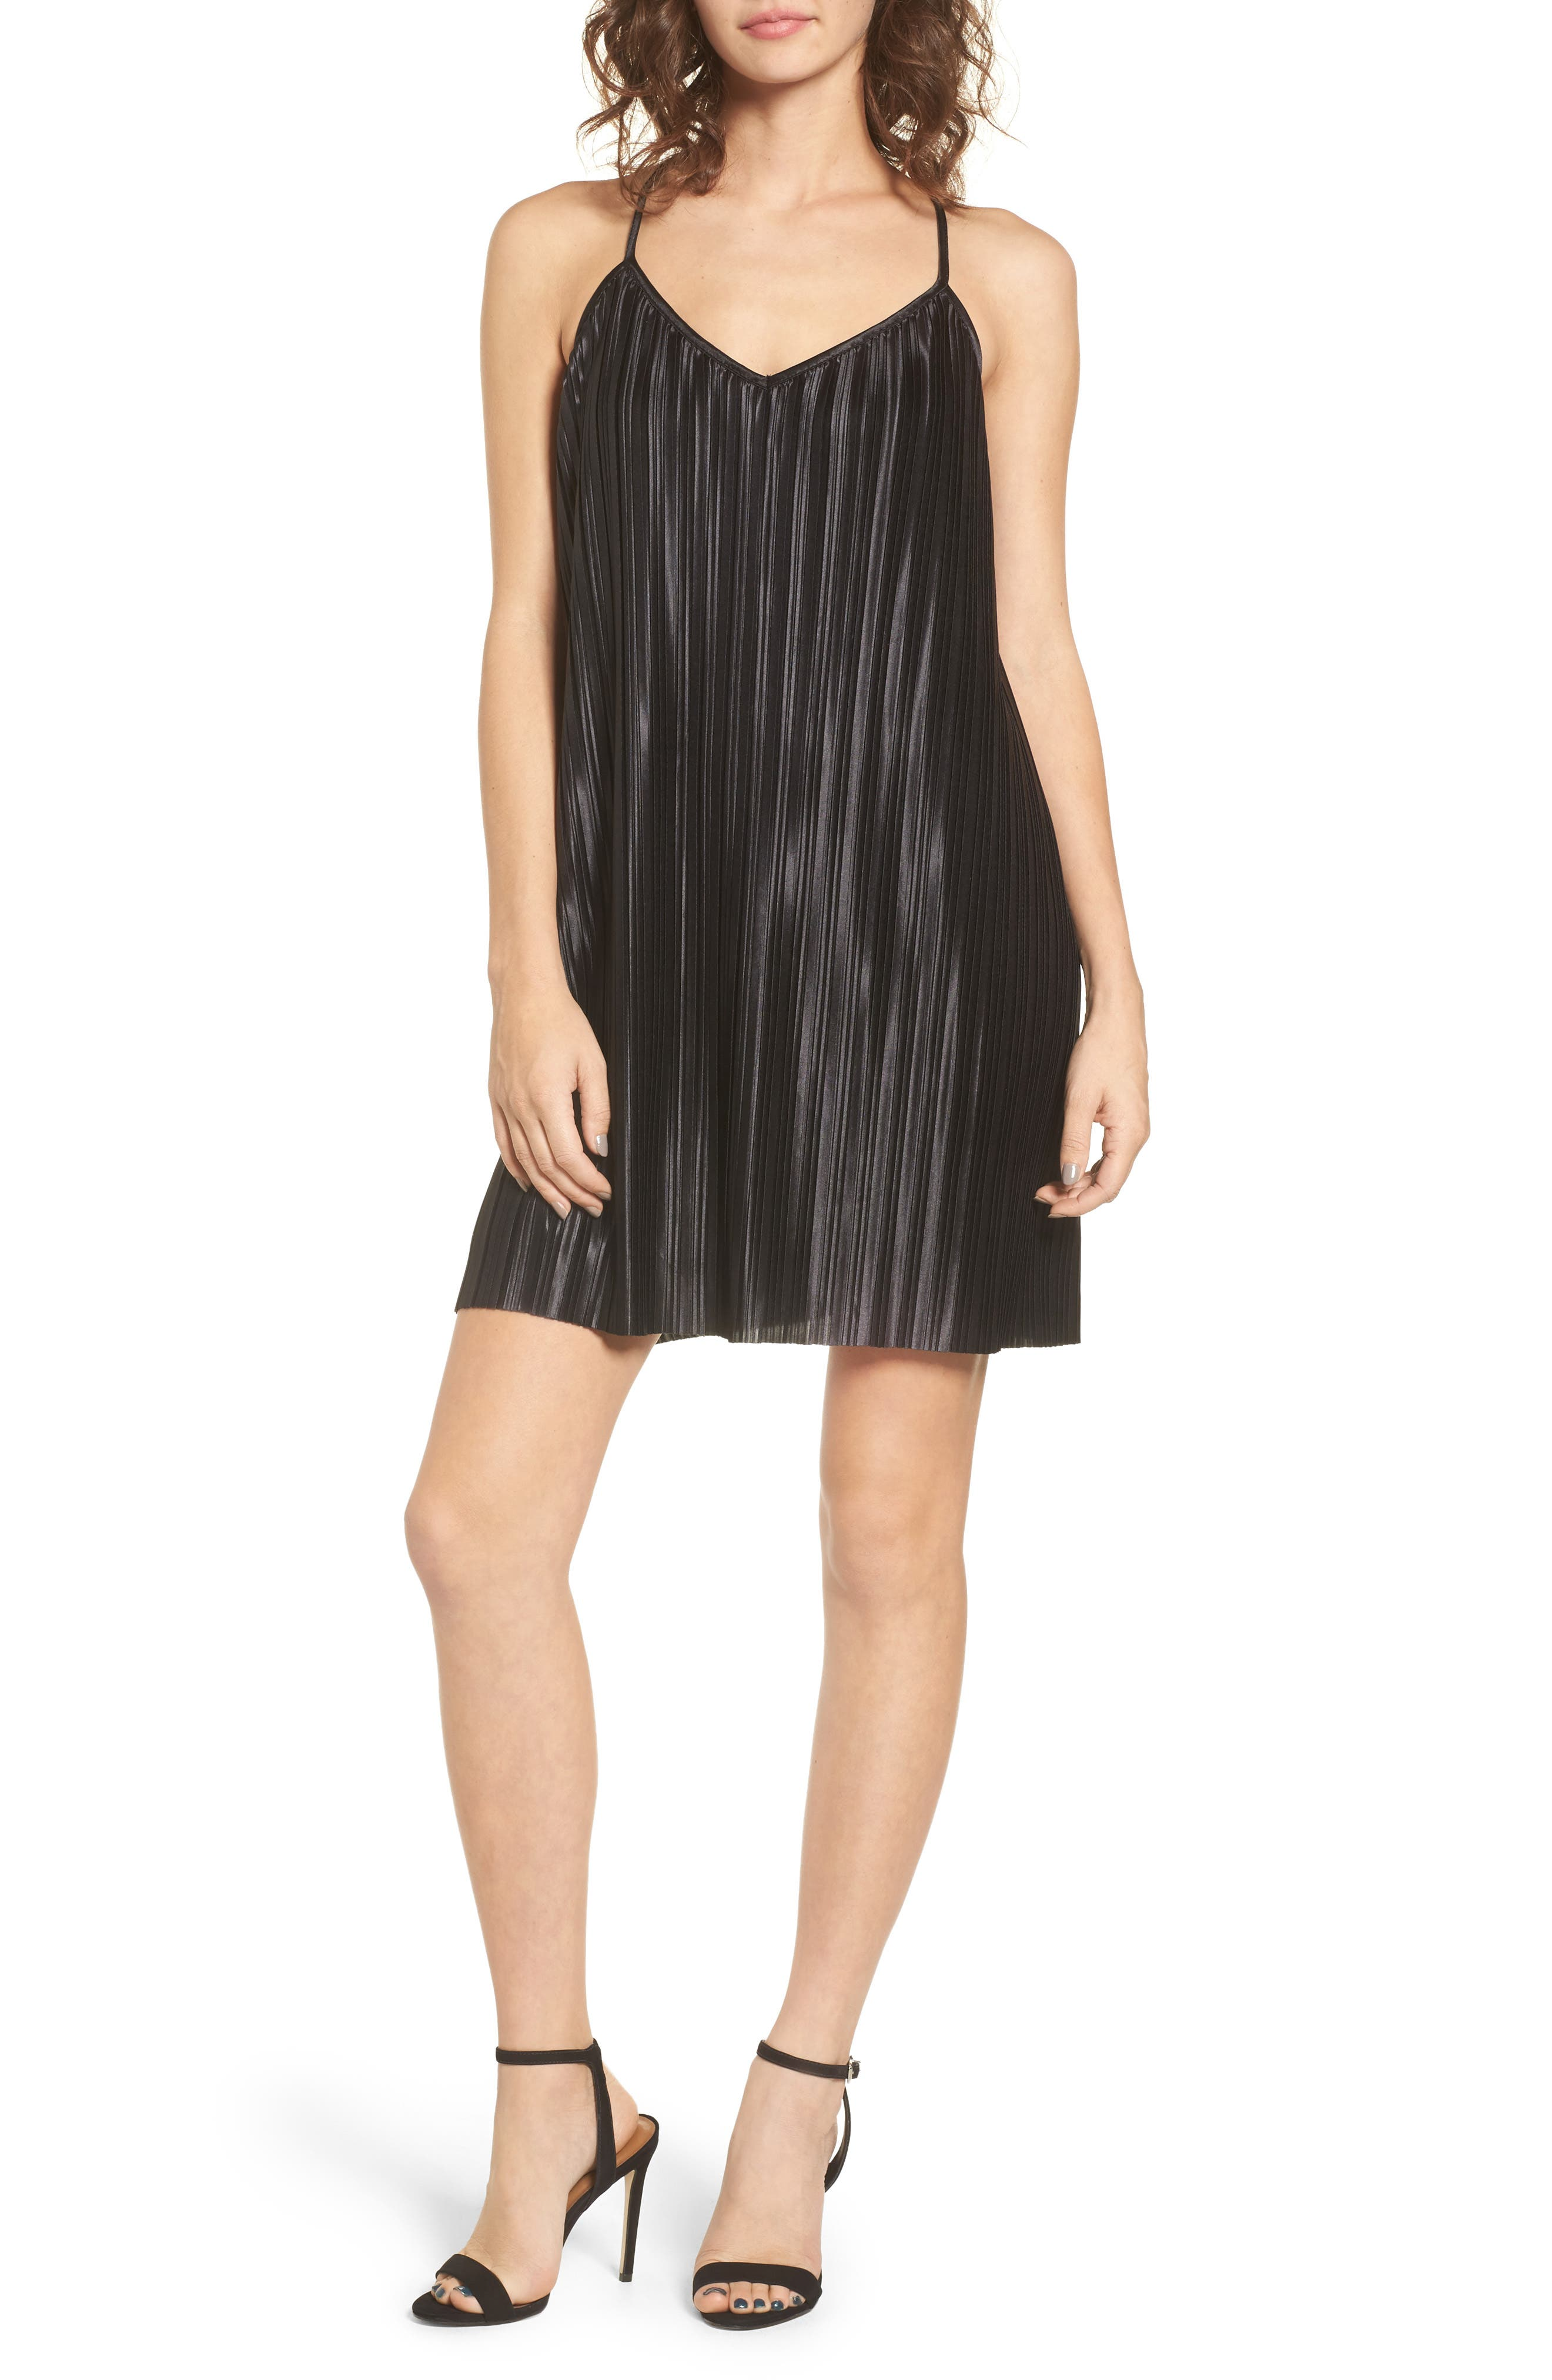 Just Pleat It Slipdress,                         Main,                         color, Black